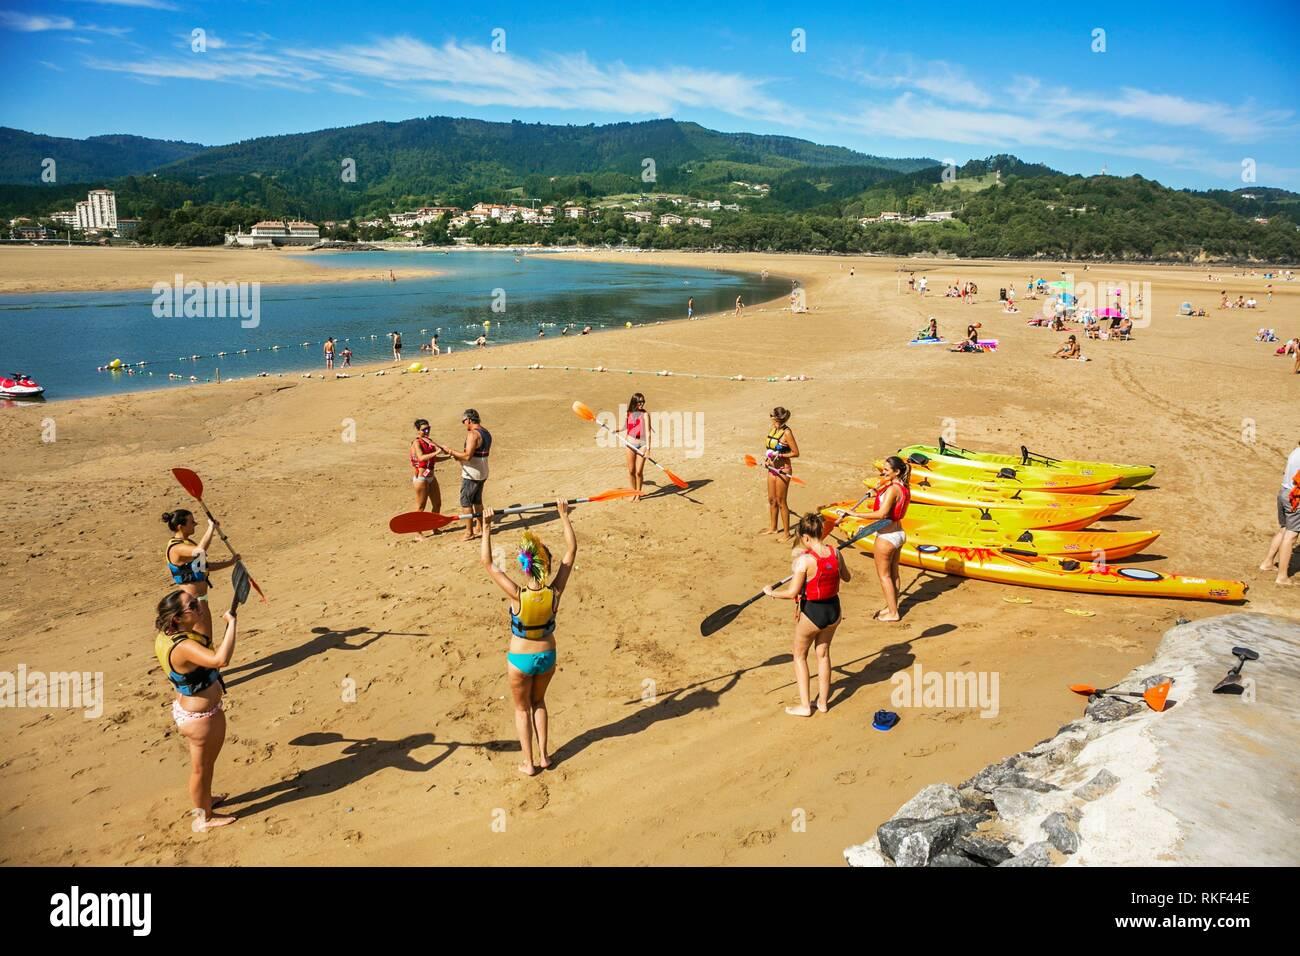 Lezioni di canoa a Laida Beach. Riserva della Biosfera di Urdaibai. Regione di Urdaibai. Bizkaia. Paese basco. Spagna. Foto Stock